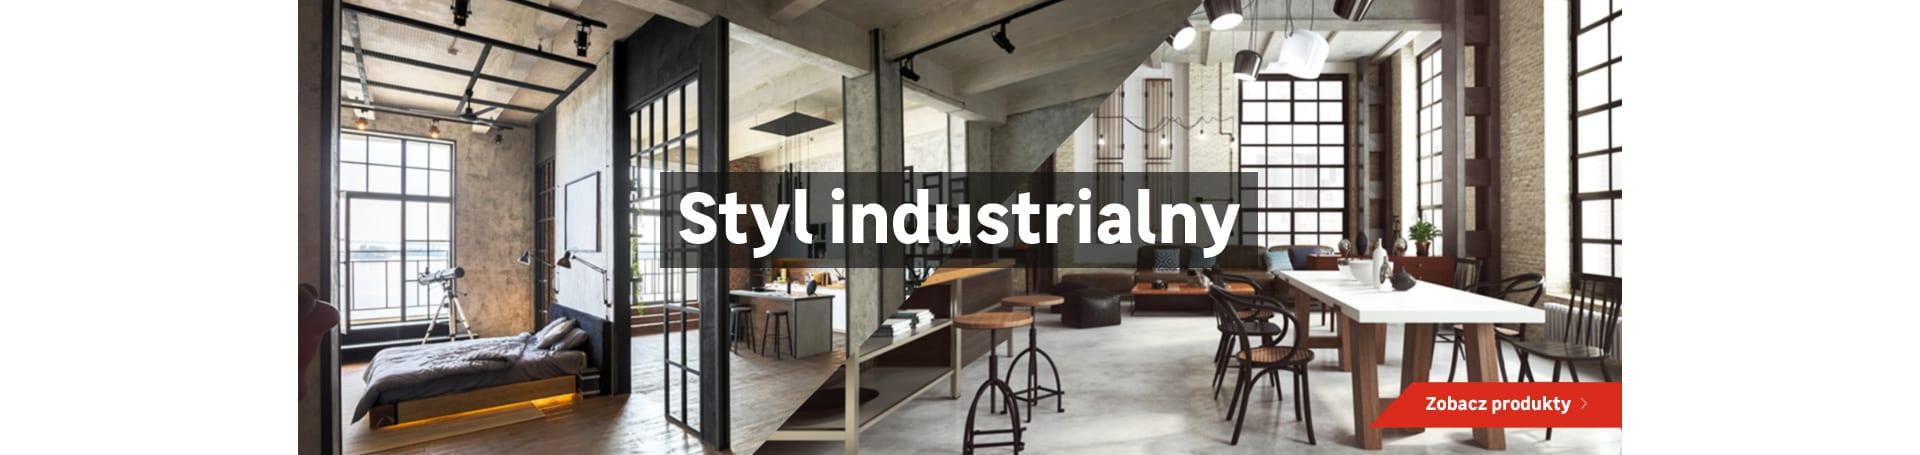 sk-styl-industrial-13-28.02.2019-1323x455